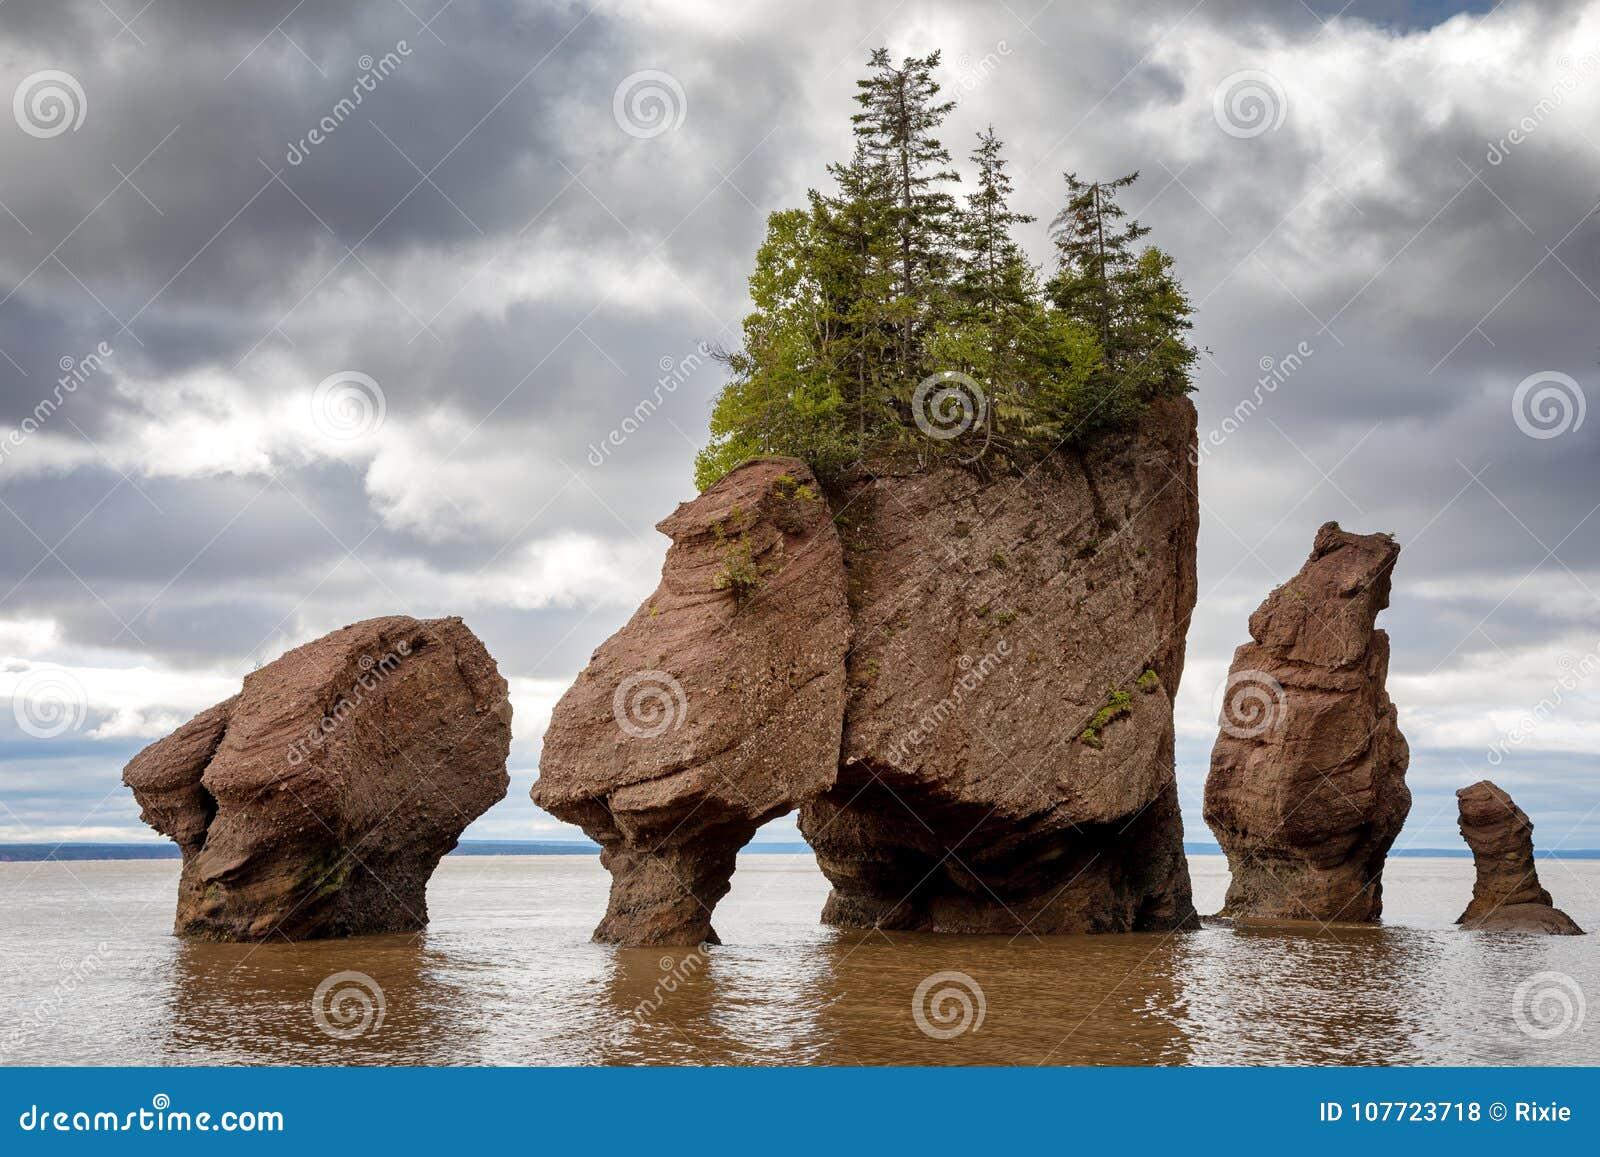 Bay Of Fundy Camping >> Flowerpot Rocks Of Hopewell New Brunswick Stock Photo Image Of